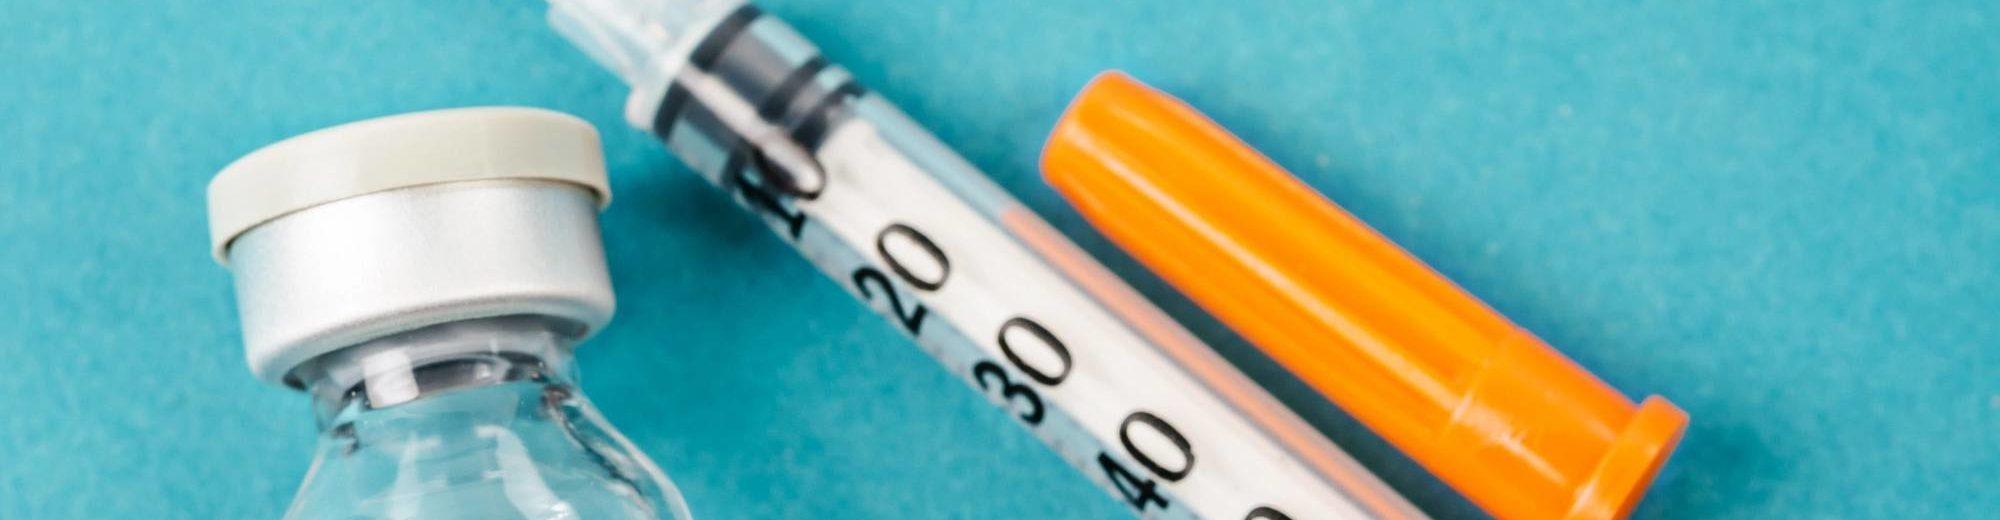 Hepatitis B HBV vaccine with syringe - Infectious Disease Trials | Amarex